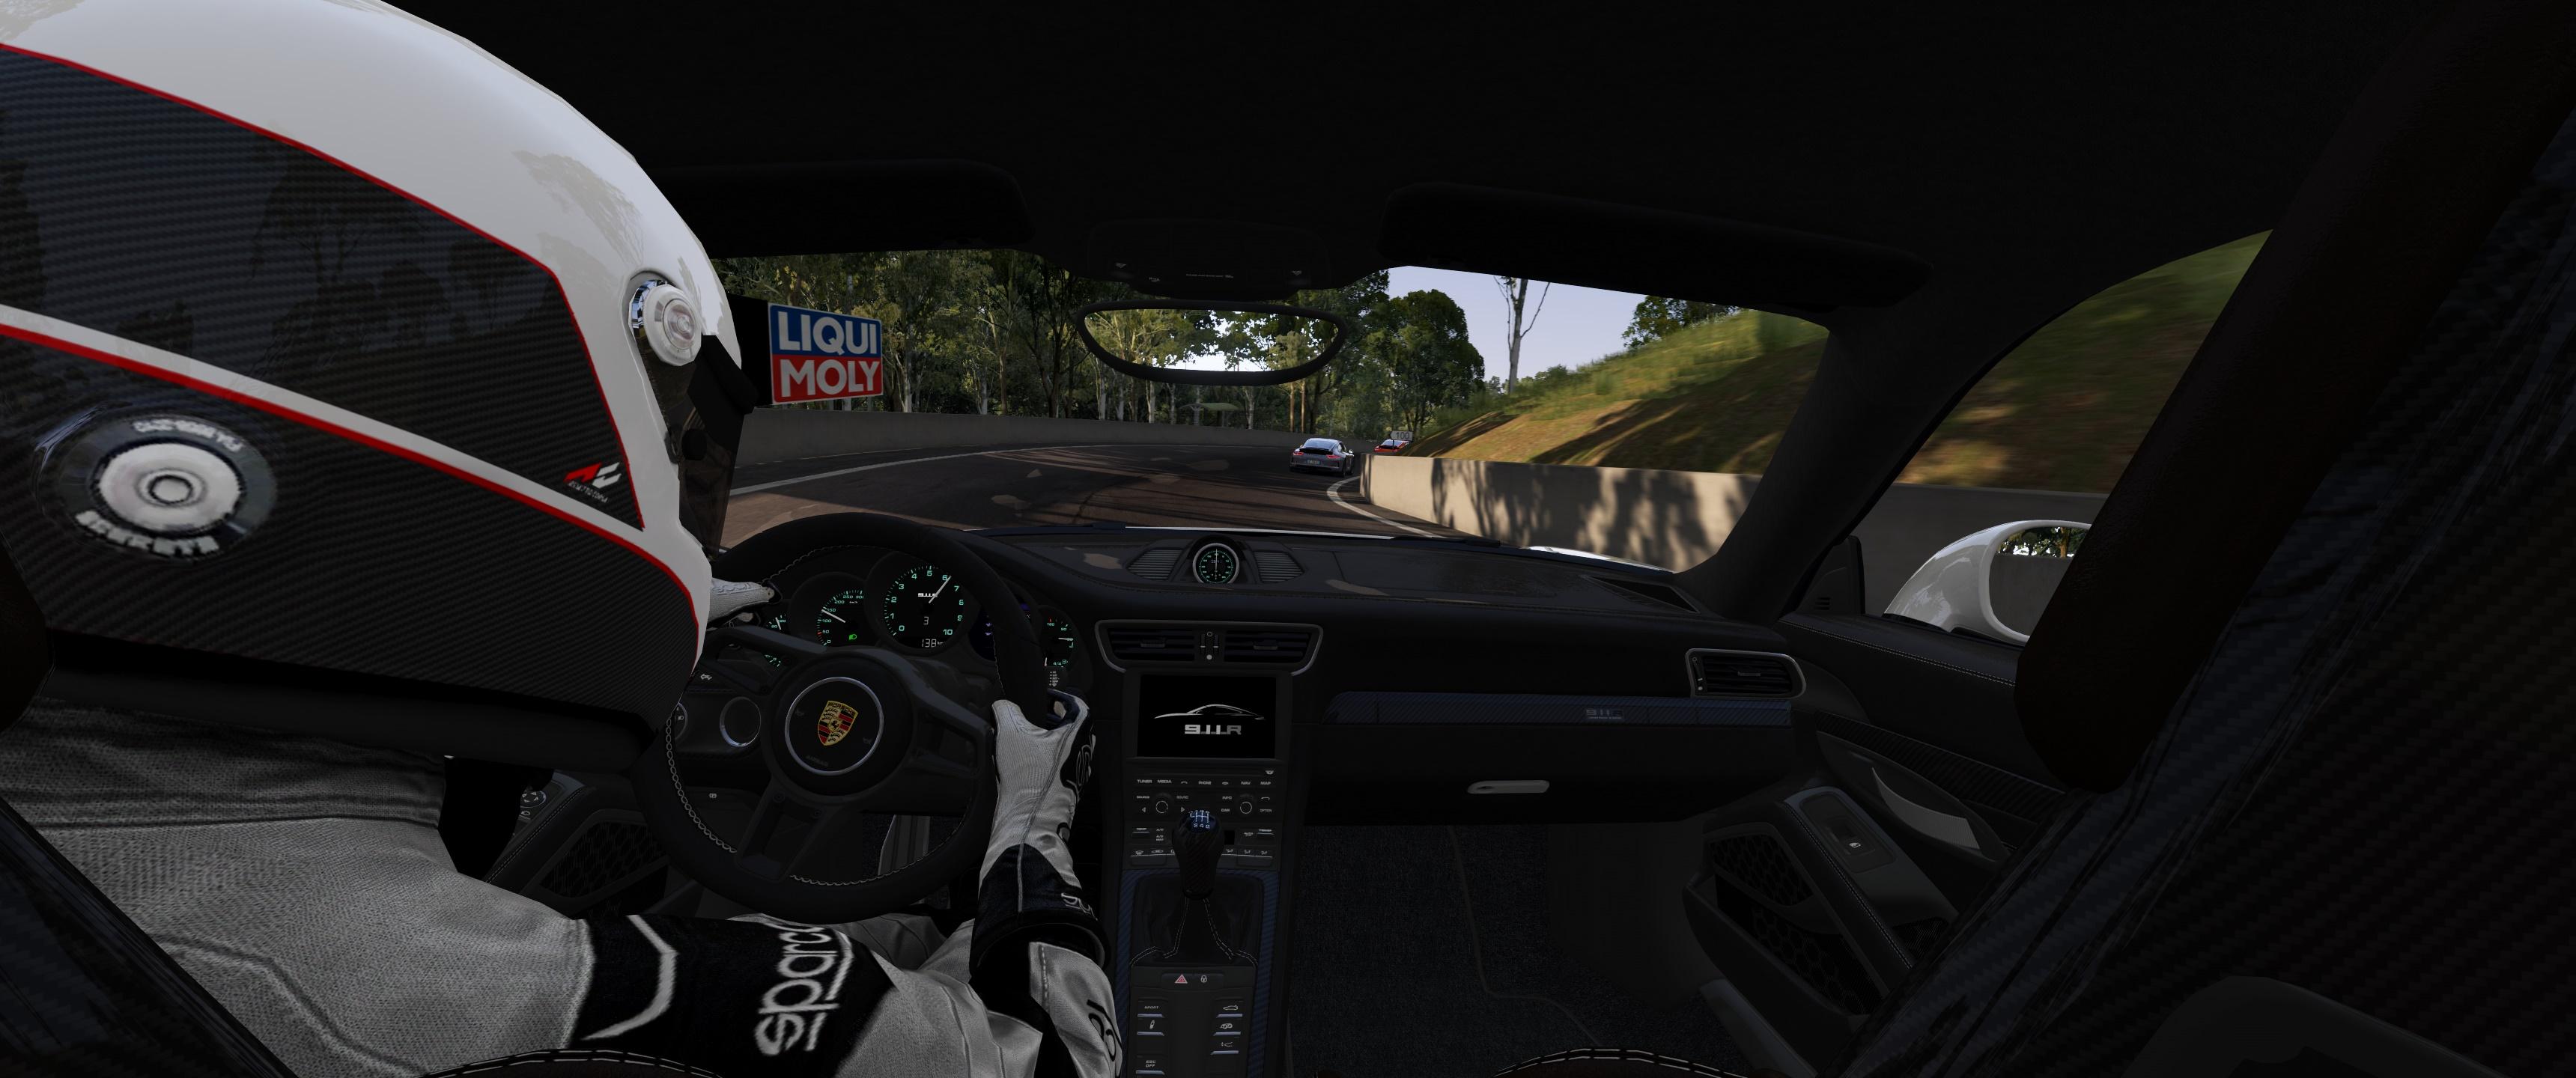 Assetto Corsa 07.03.2017 - 22.56.27.09.jpg